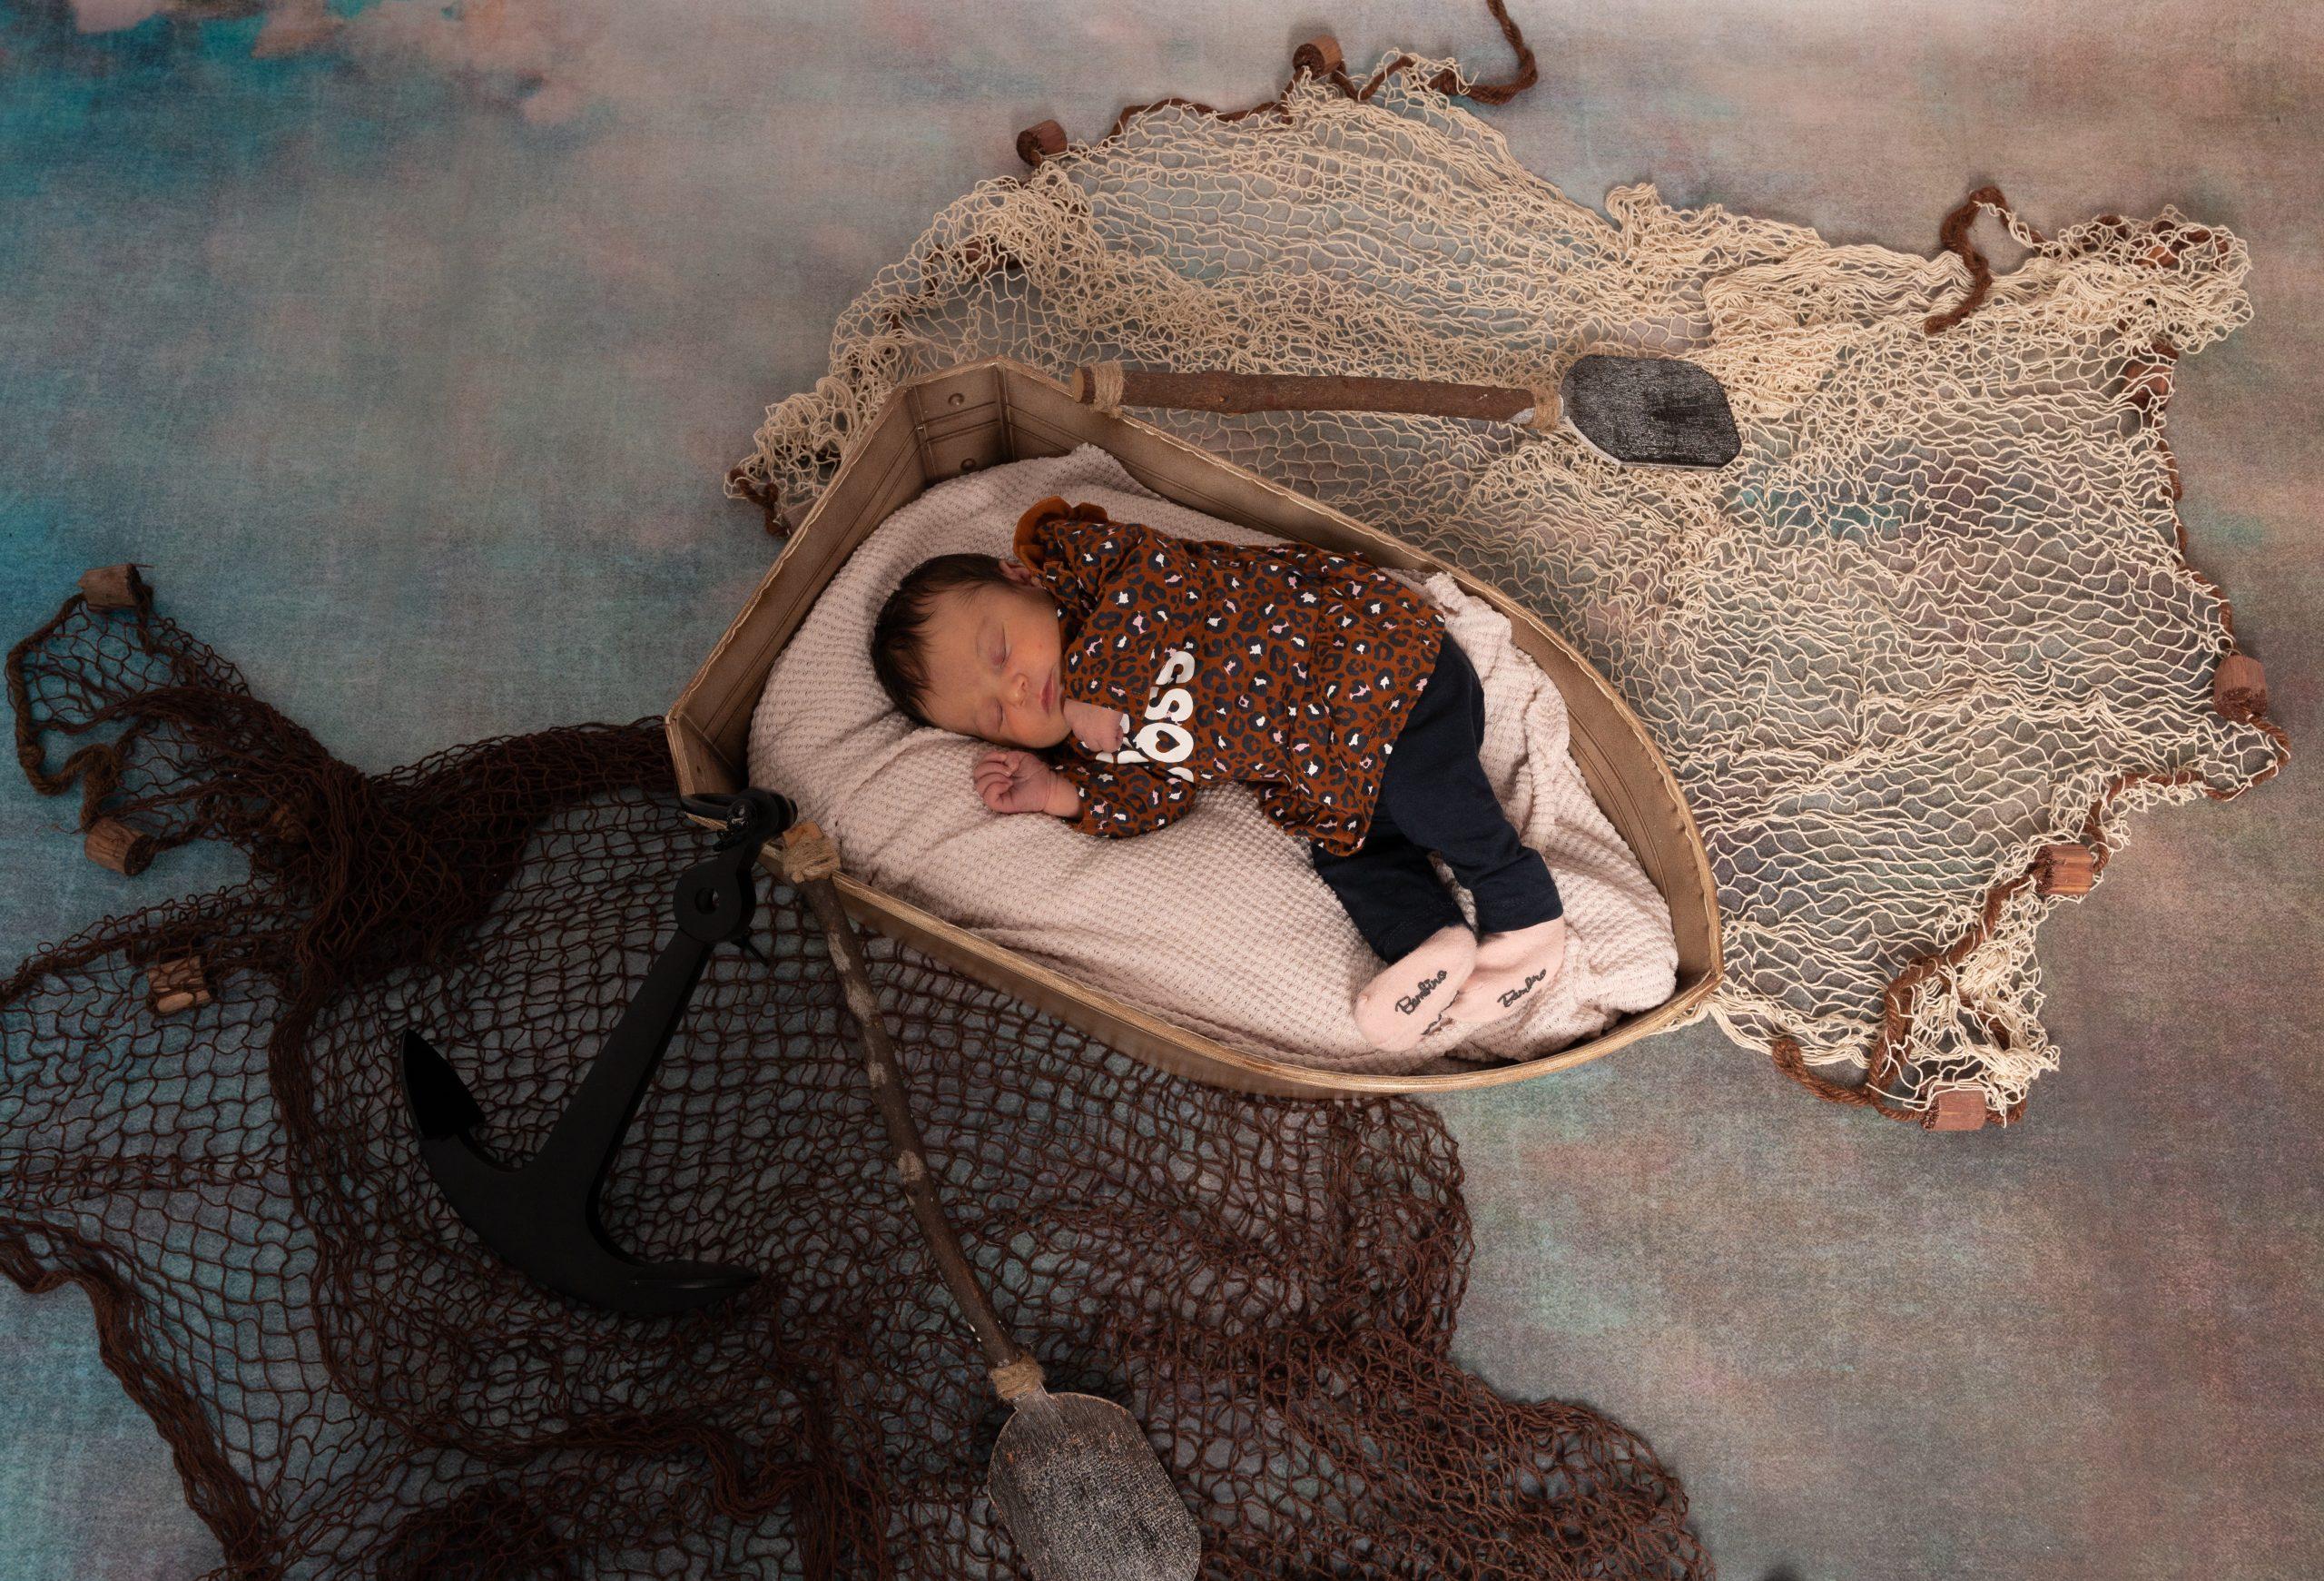 newborn fotoshoot, kinder fotoshoot, kids fotoshoot, puber fotoschoot sophiafotografie